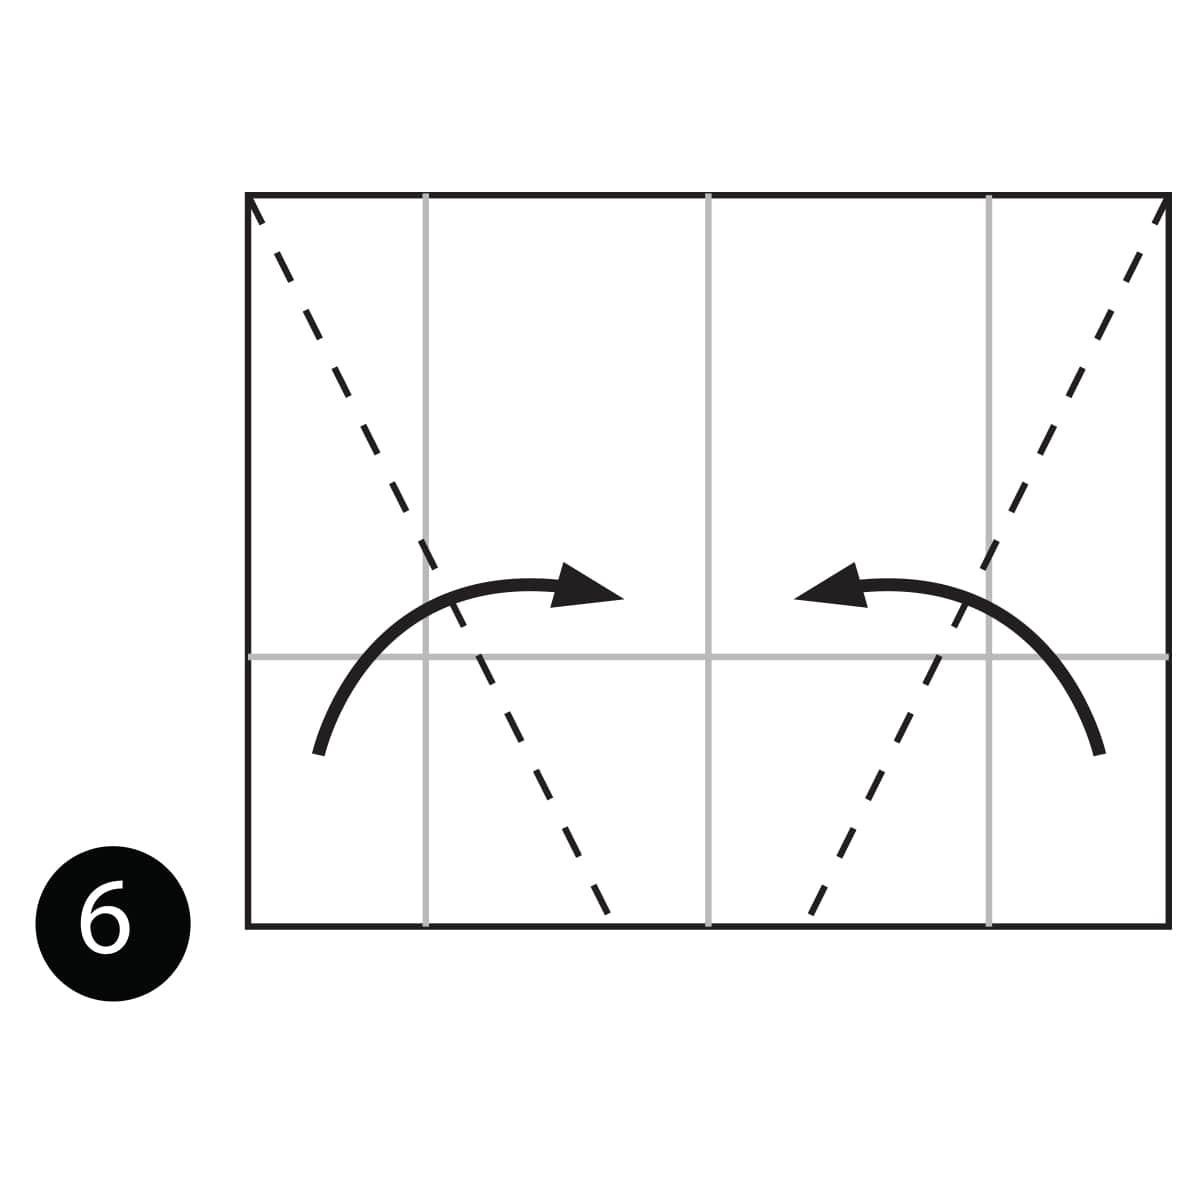 Platypus Step 6